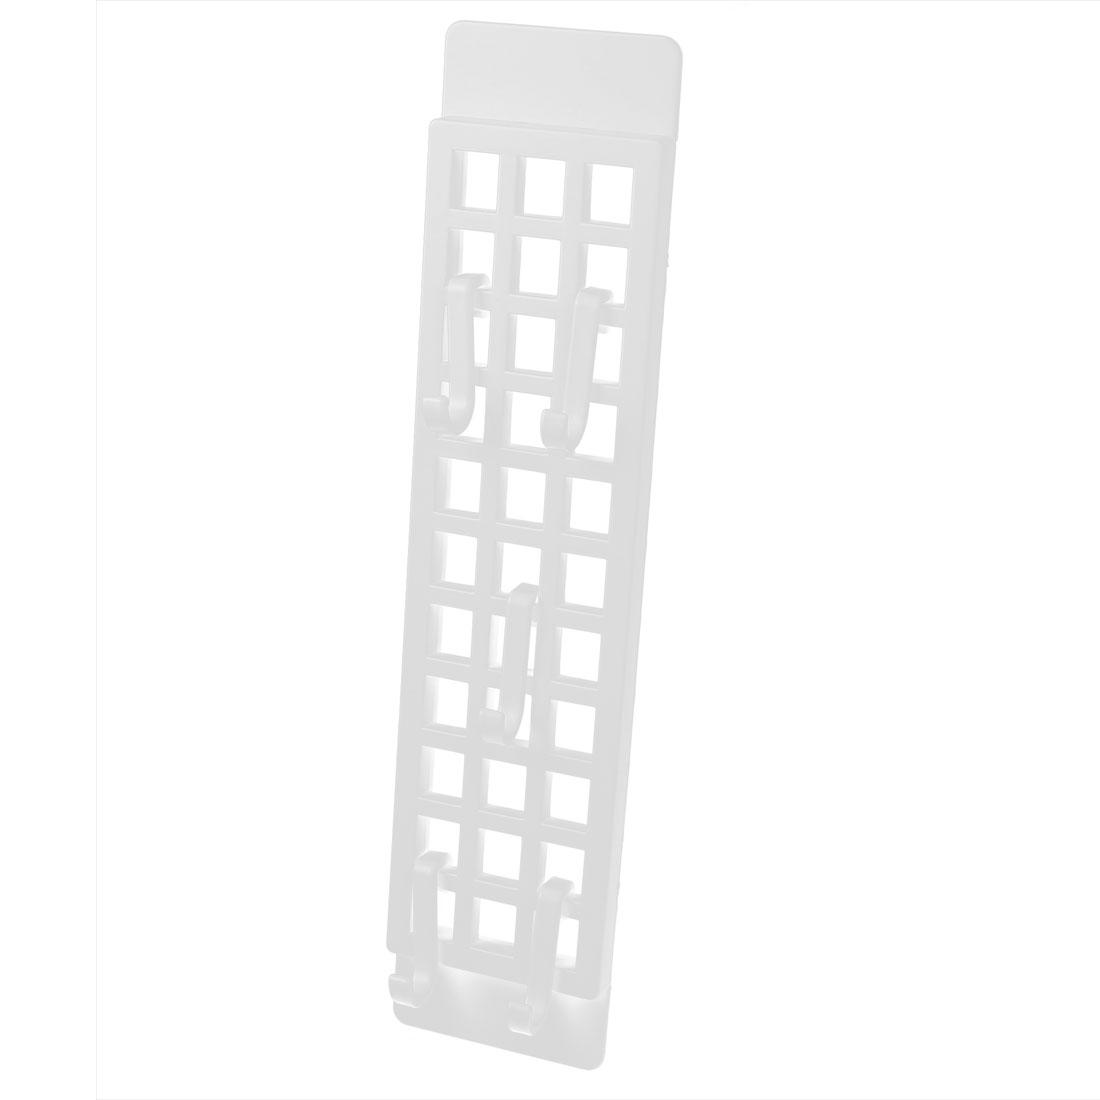 Household Kitchenware Plastic Spoon Accessories Hanger White